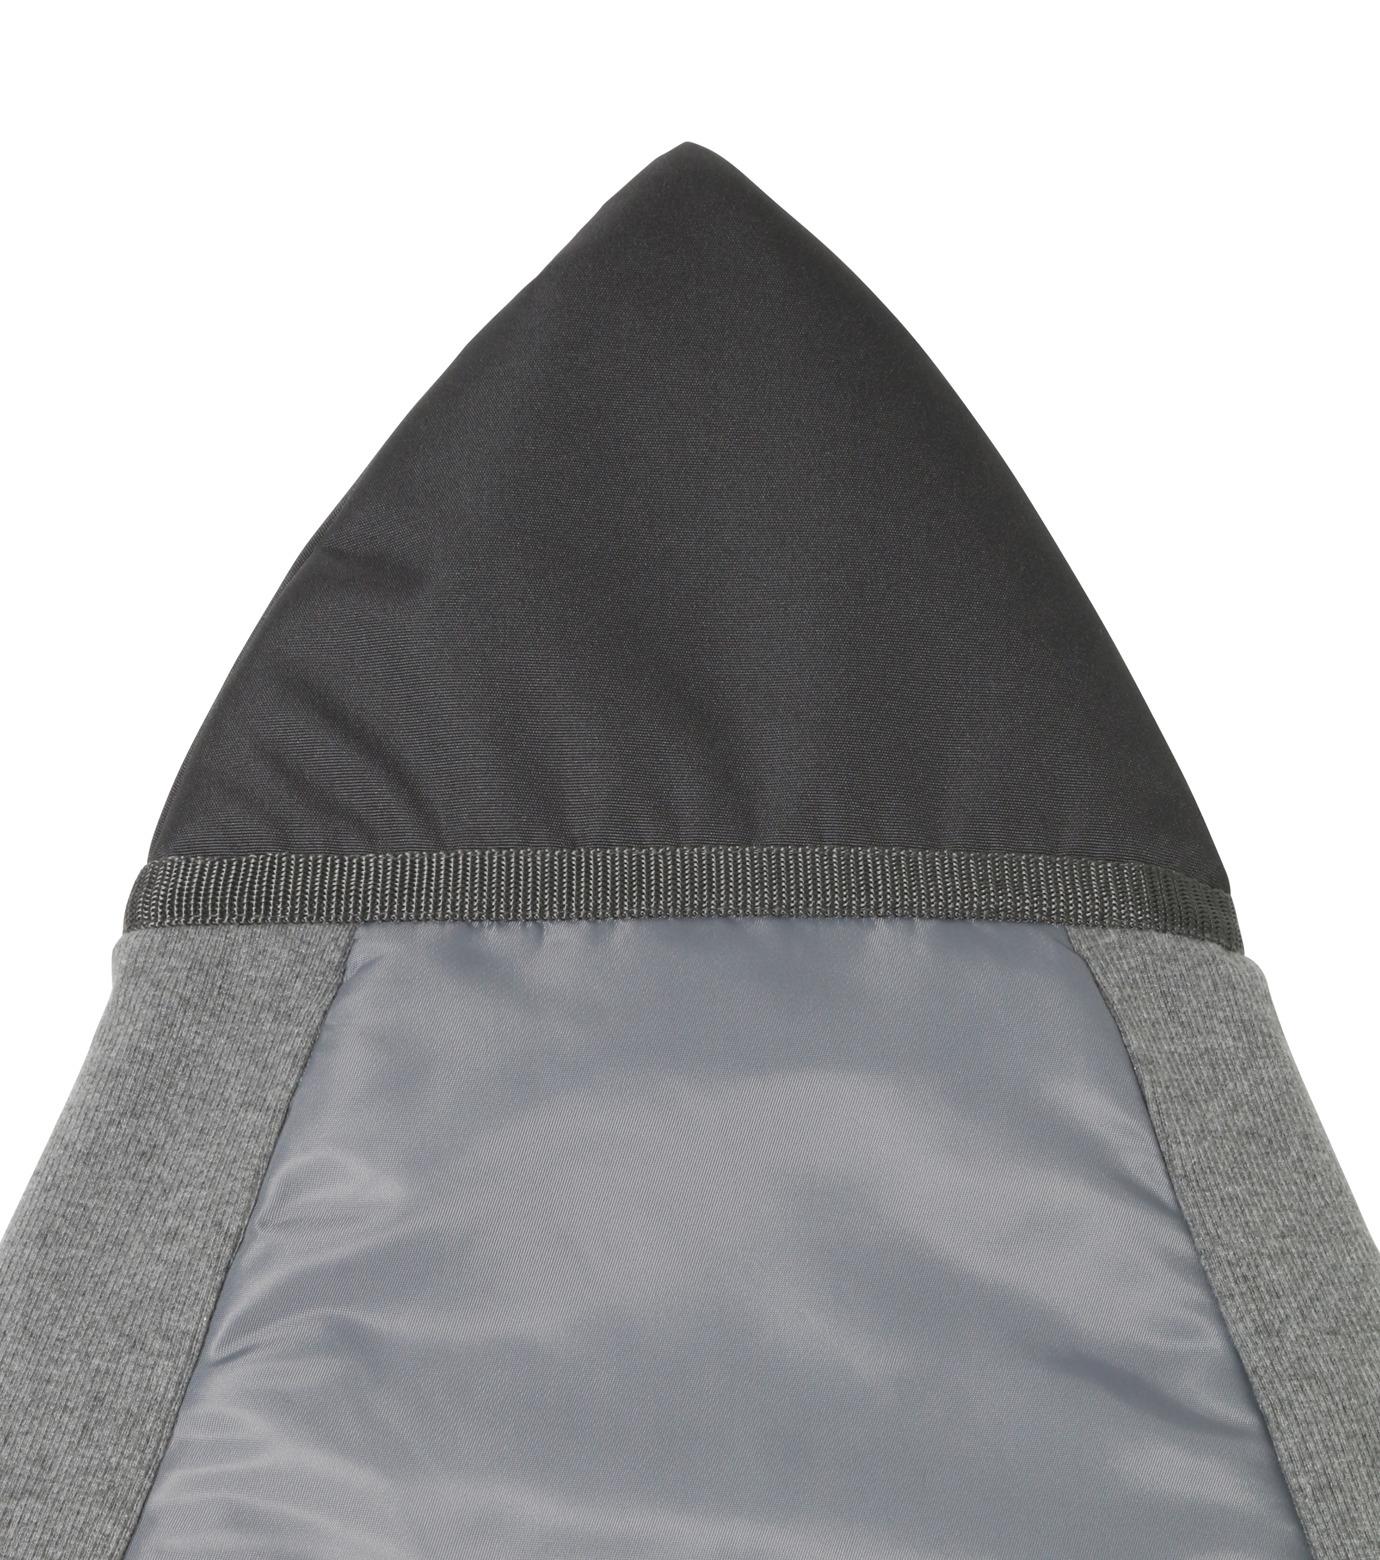 HEY YOU !(ヘイユウ)のSurfboard Jacket Short (S size)-GRAY(サーフ/OUTDOOR/surf/OUTDOOR)-18S90009-11 拡大詳細画像2